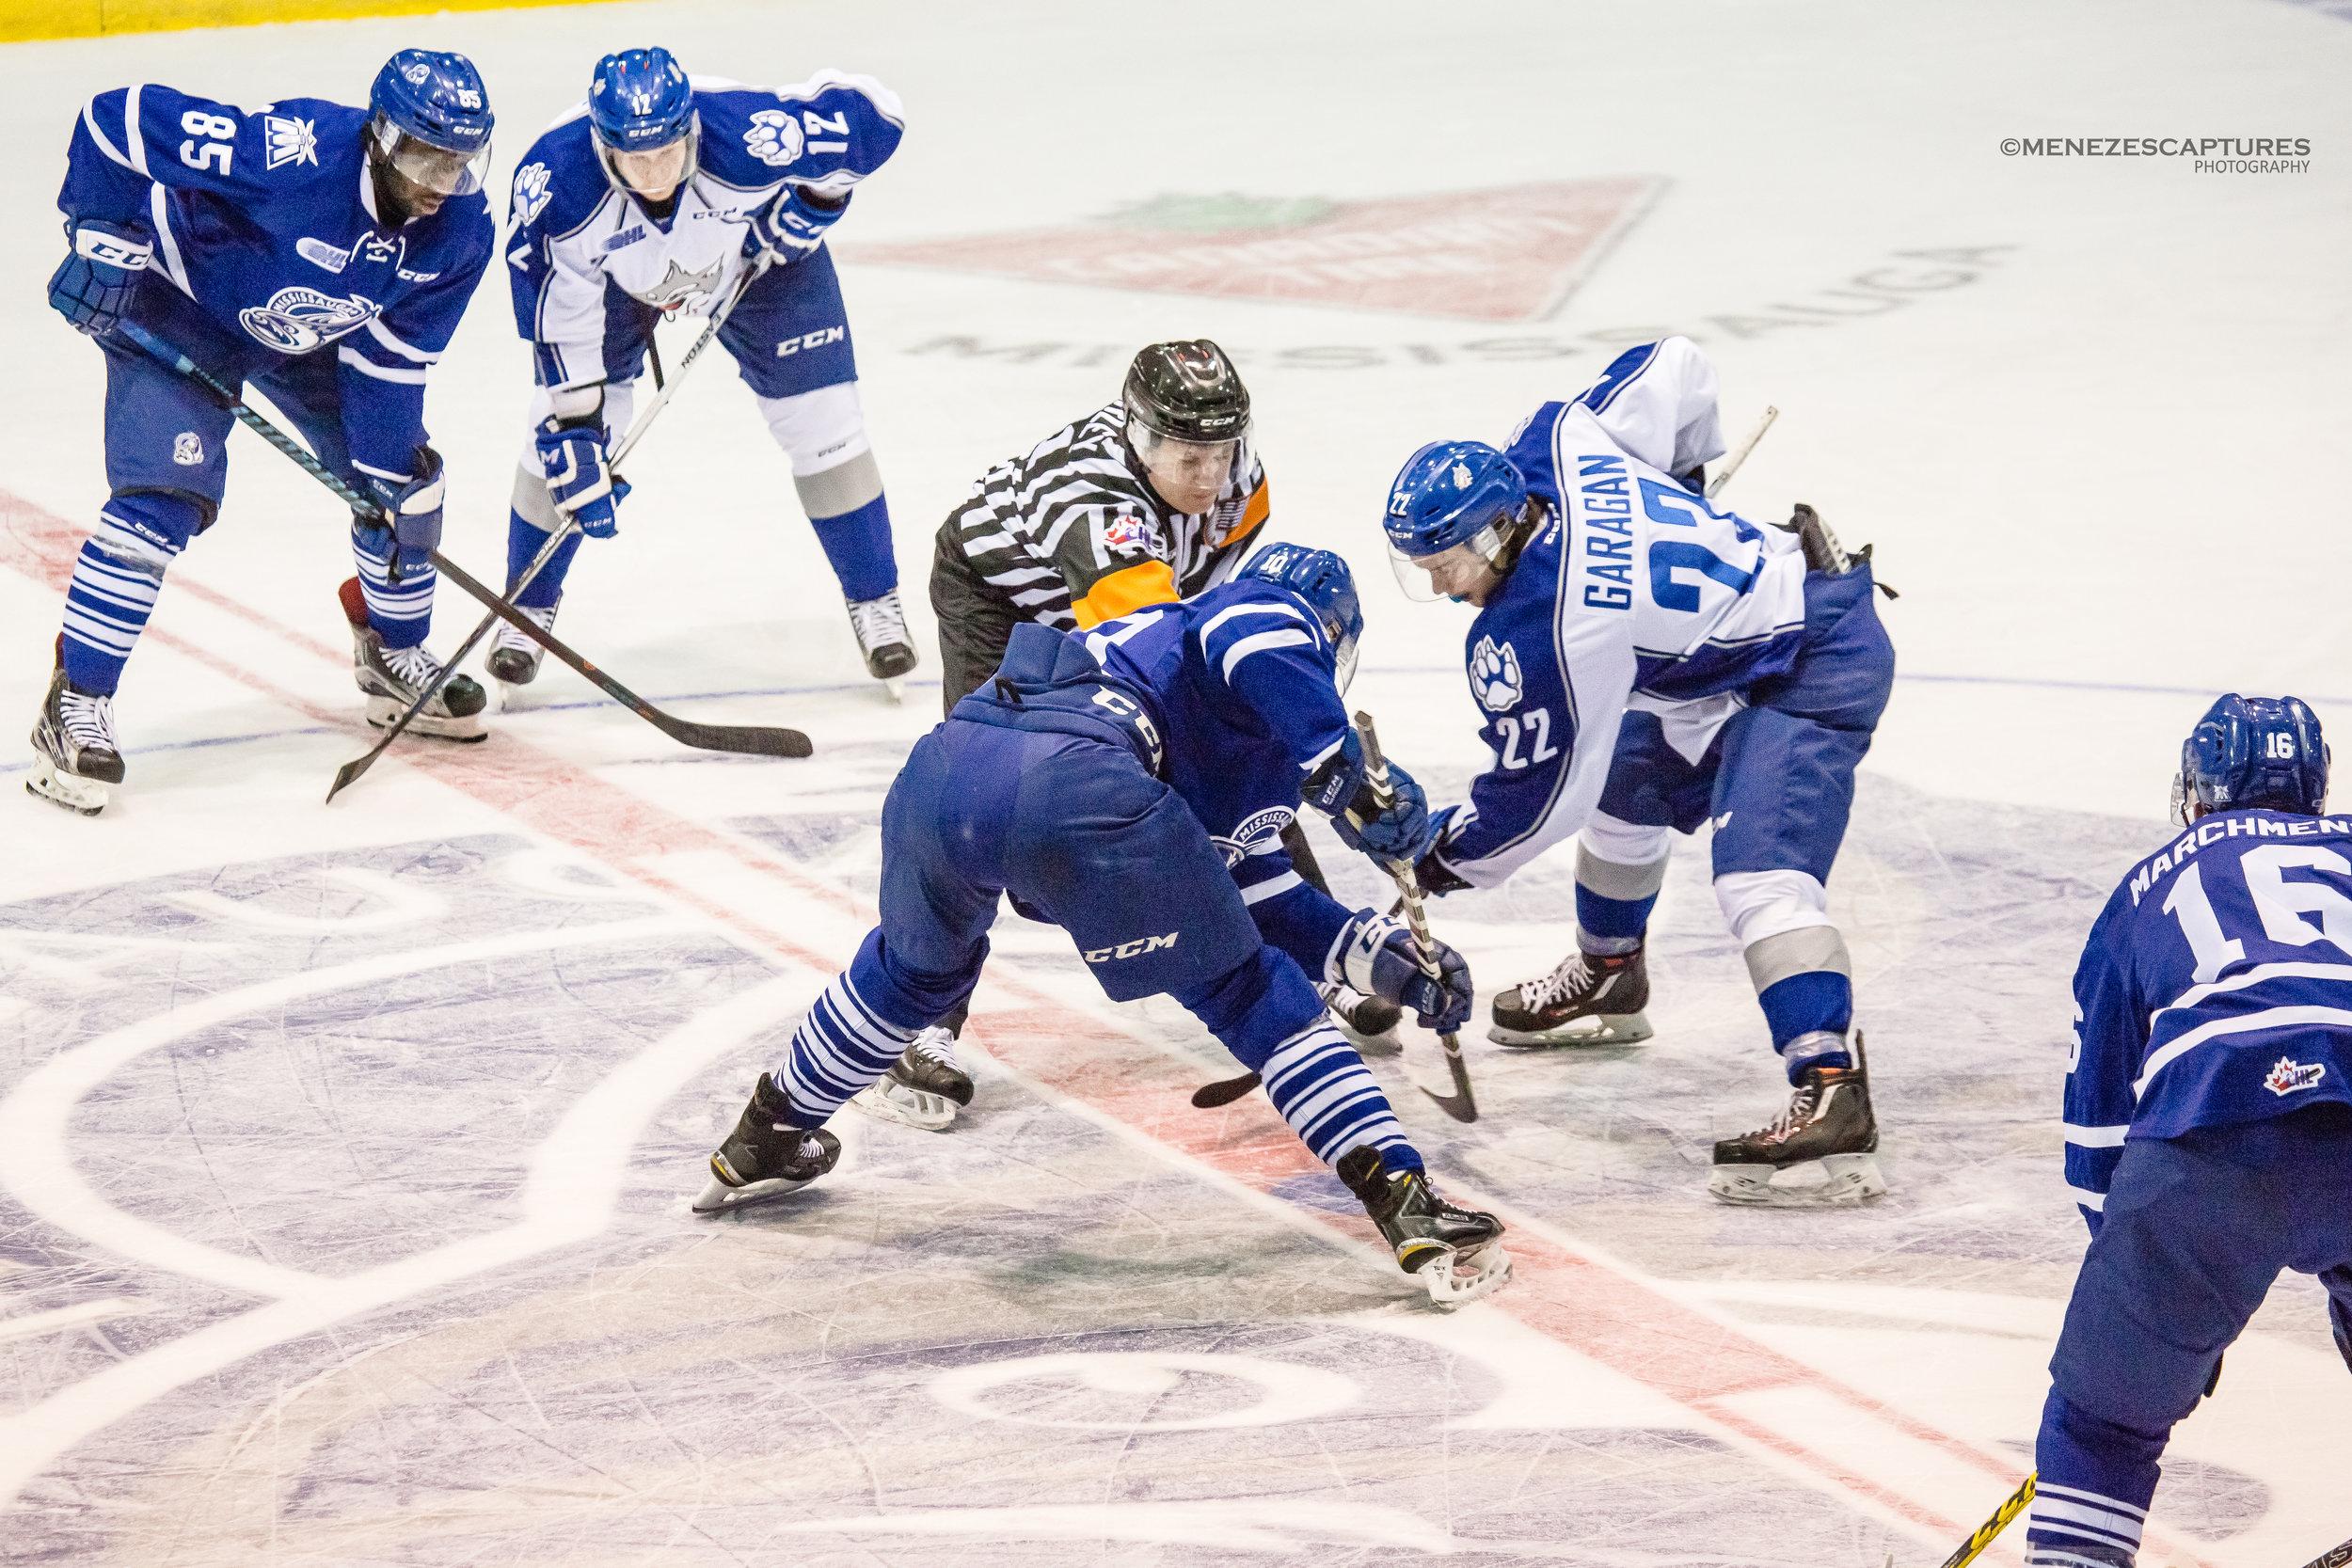 Mississauga Steelheads puck drop versus the Sudbury Wolves (2017)